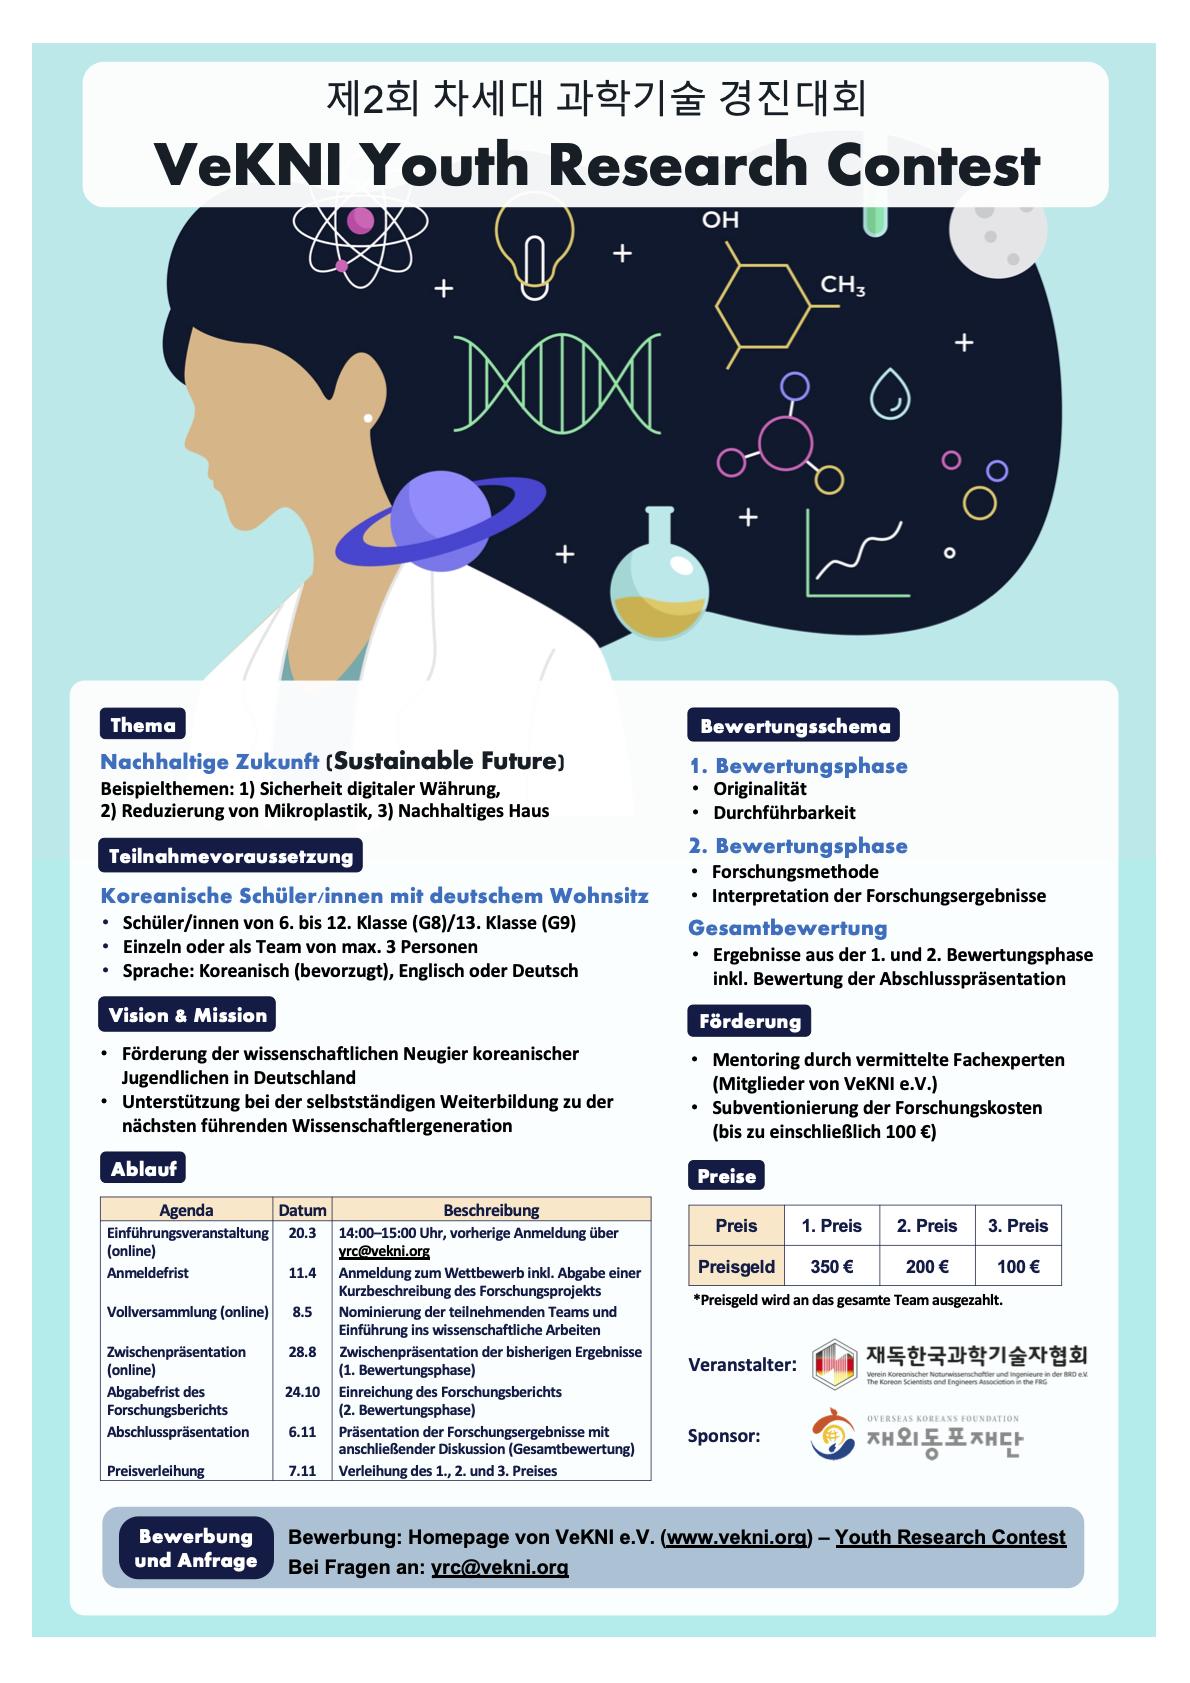 VeKNI_과학경진대회_2021_포스터2.png